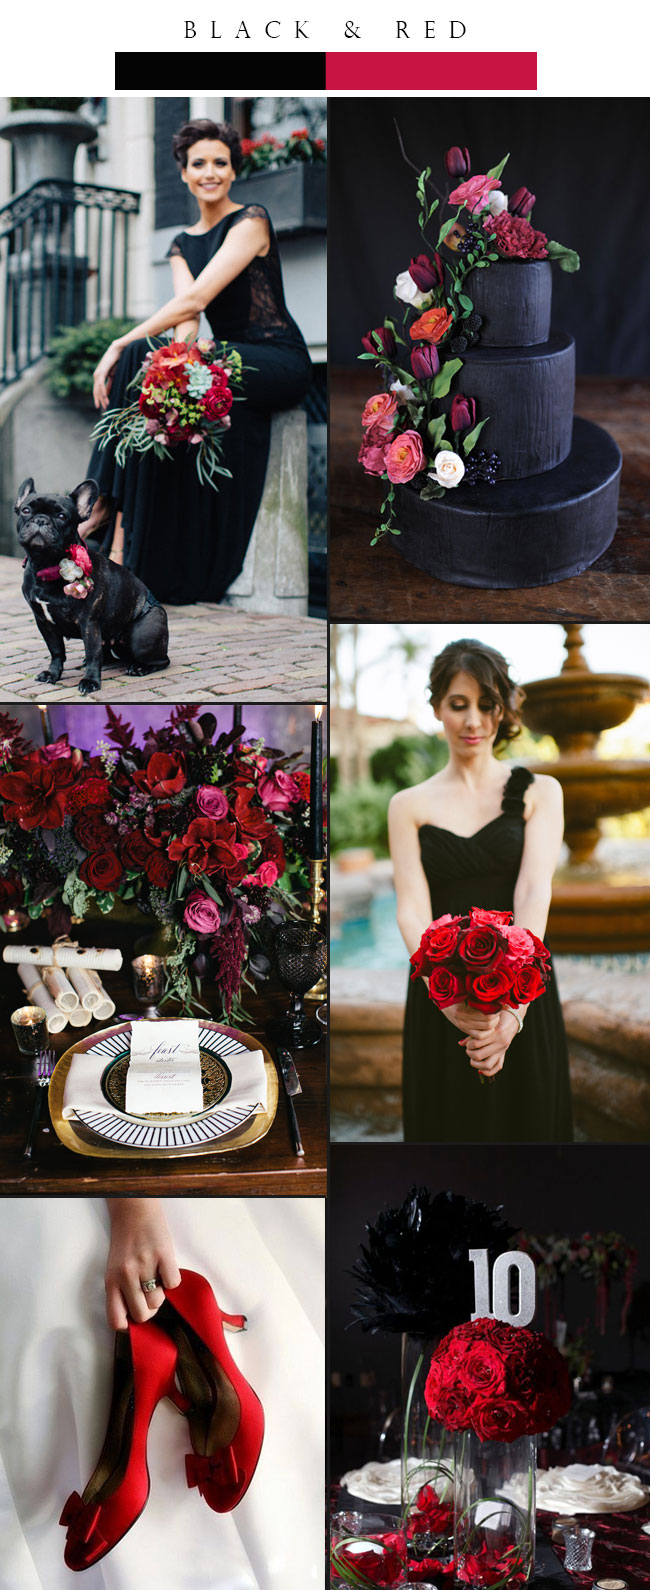 Top 3 Glamorous Black Winter Wedding Color Palette Ideas